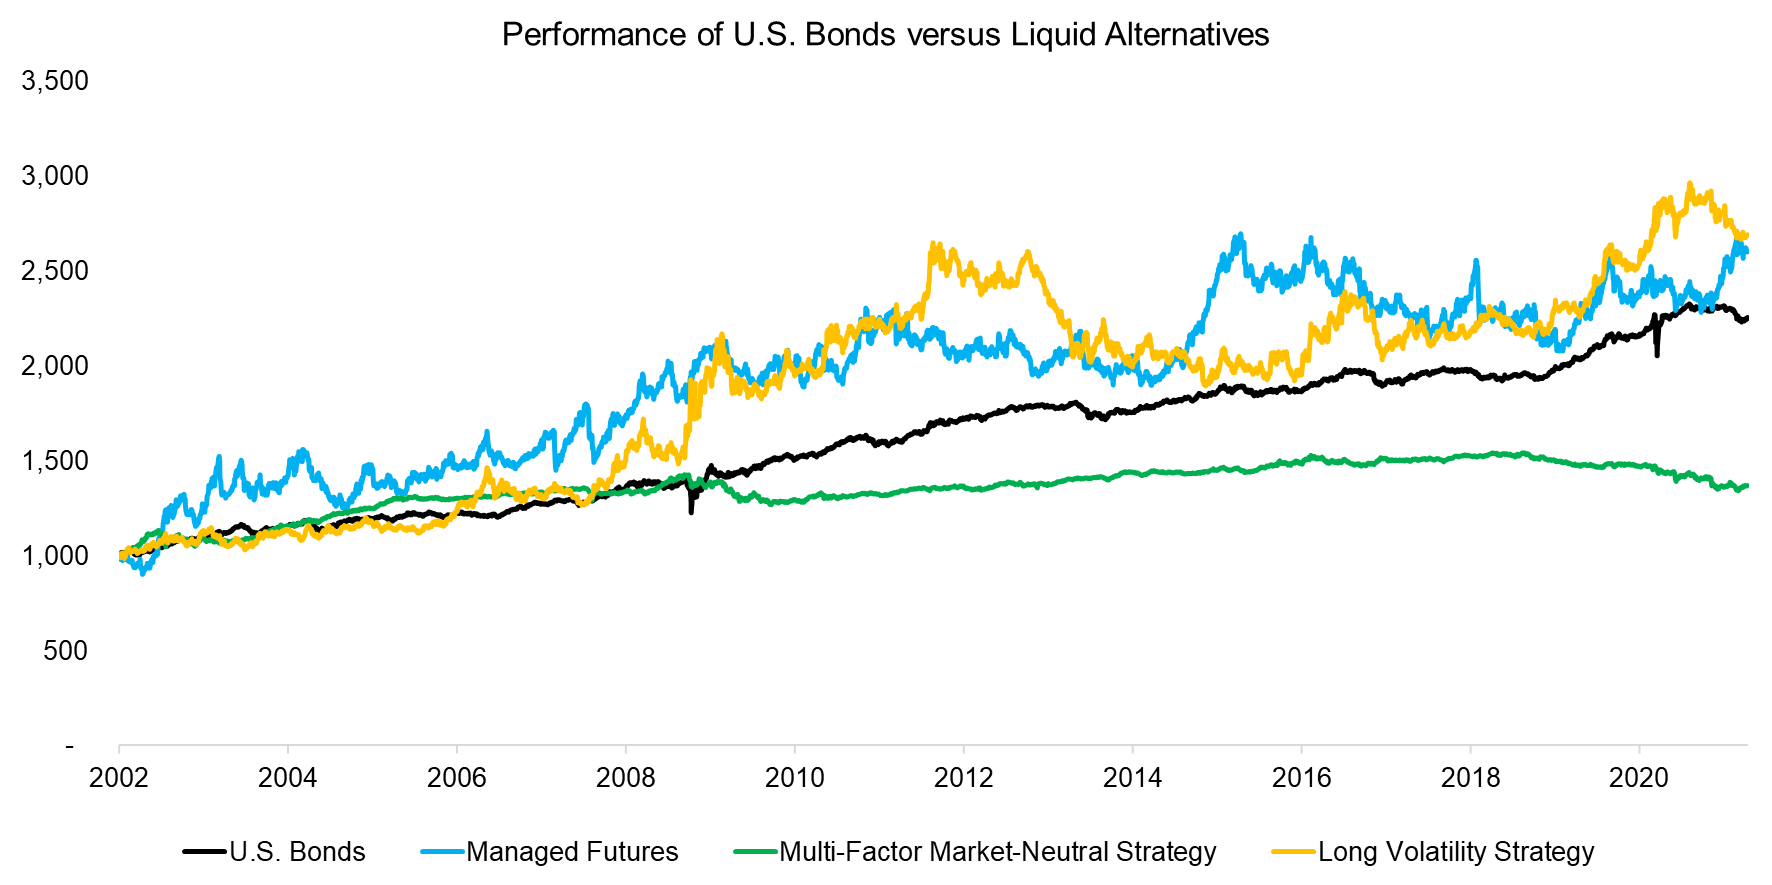 Performance of US Bonds versus Liquid Alternatives